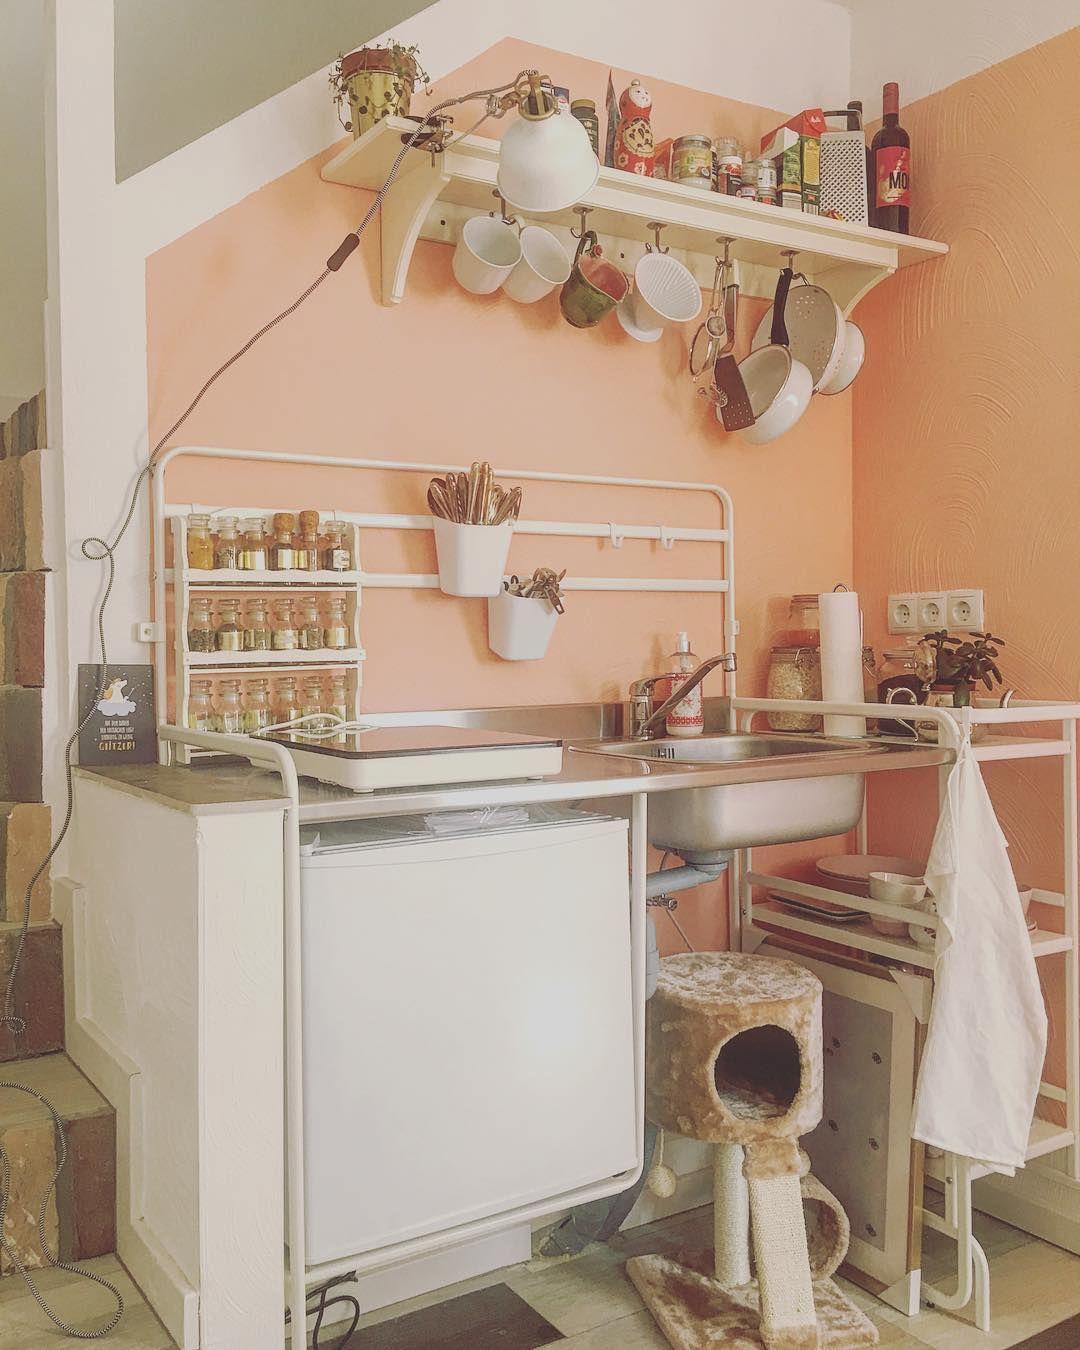 Sunnersta Mini Kitchen Ikea Original Credit Lady Or Tramp On Instagram Hipster Kitchen Ikea Kitchen Design Ikea Hack Kitchen